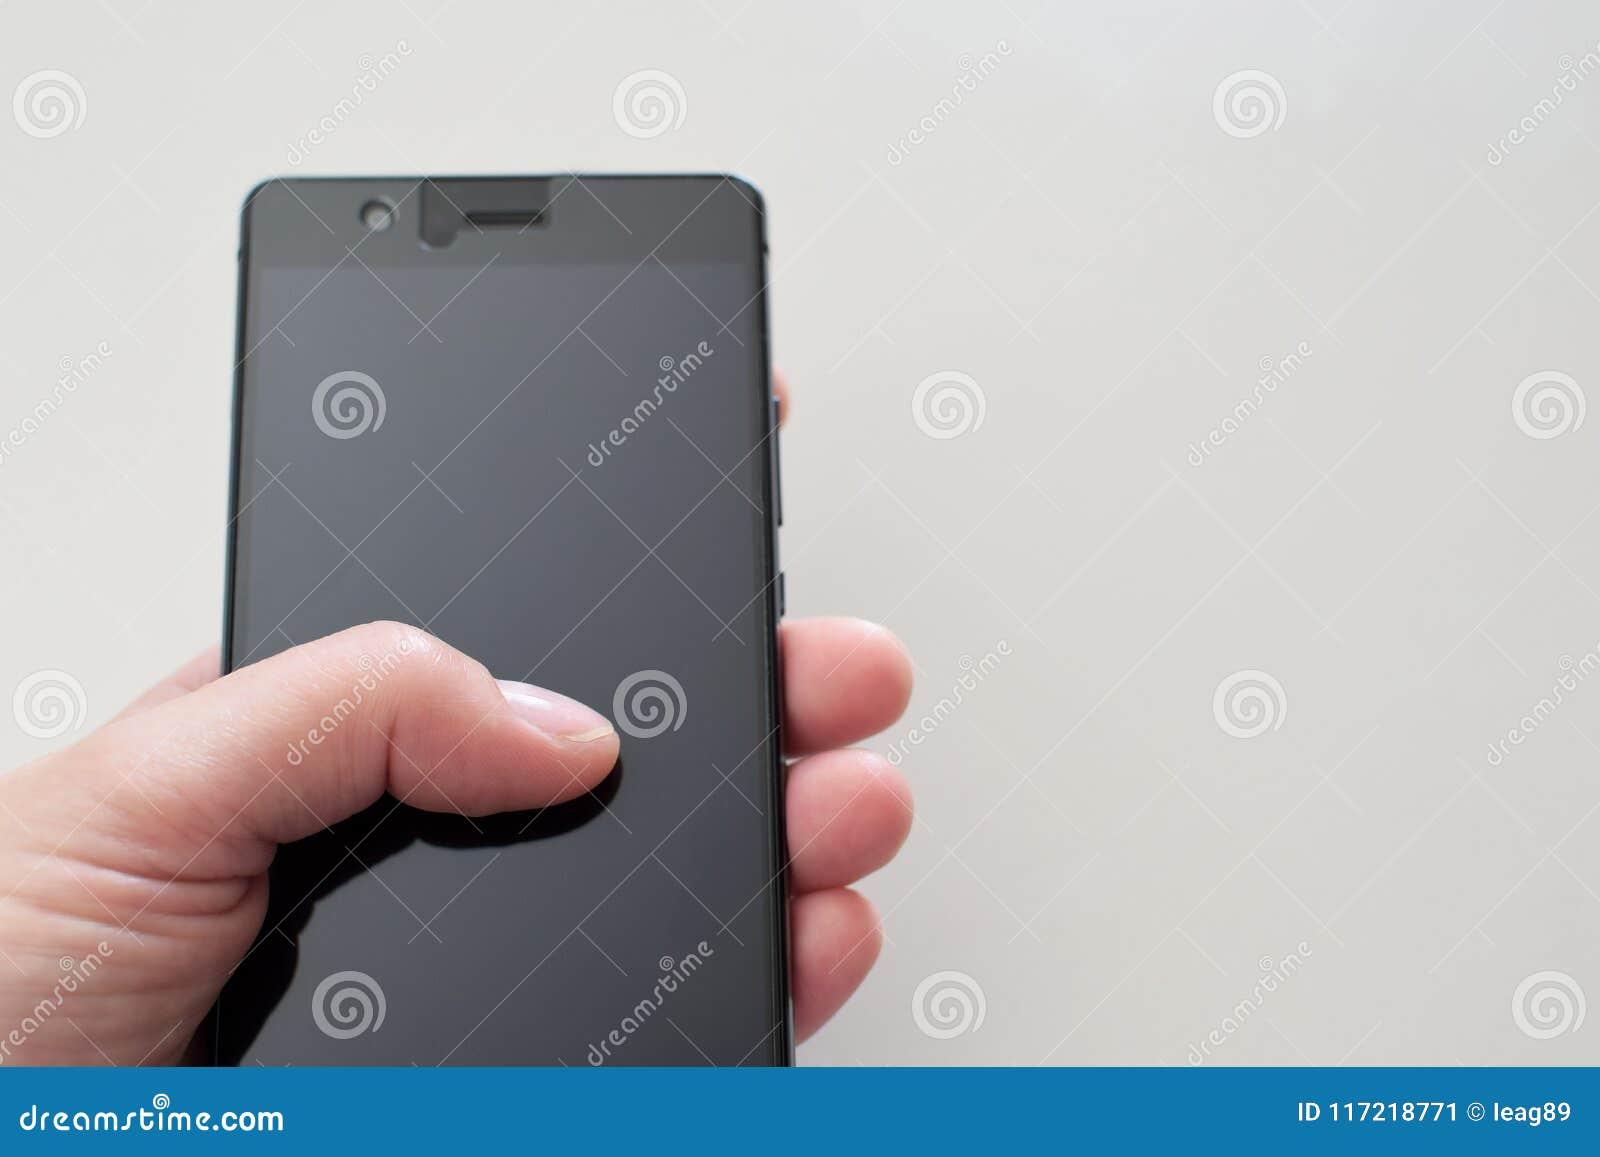 Woman hand holding black smartphone